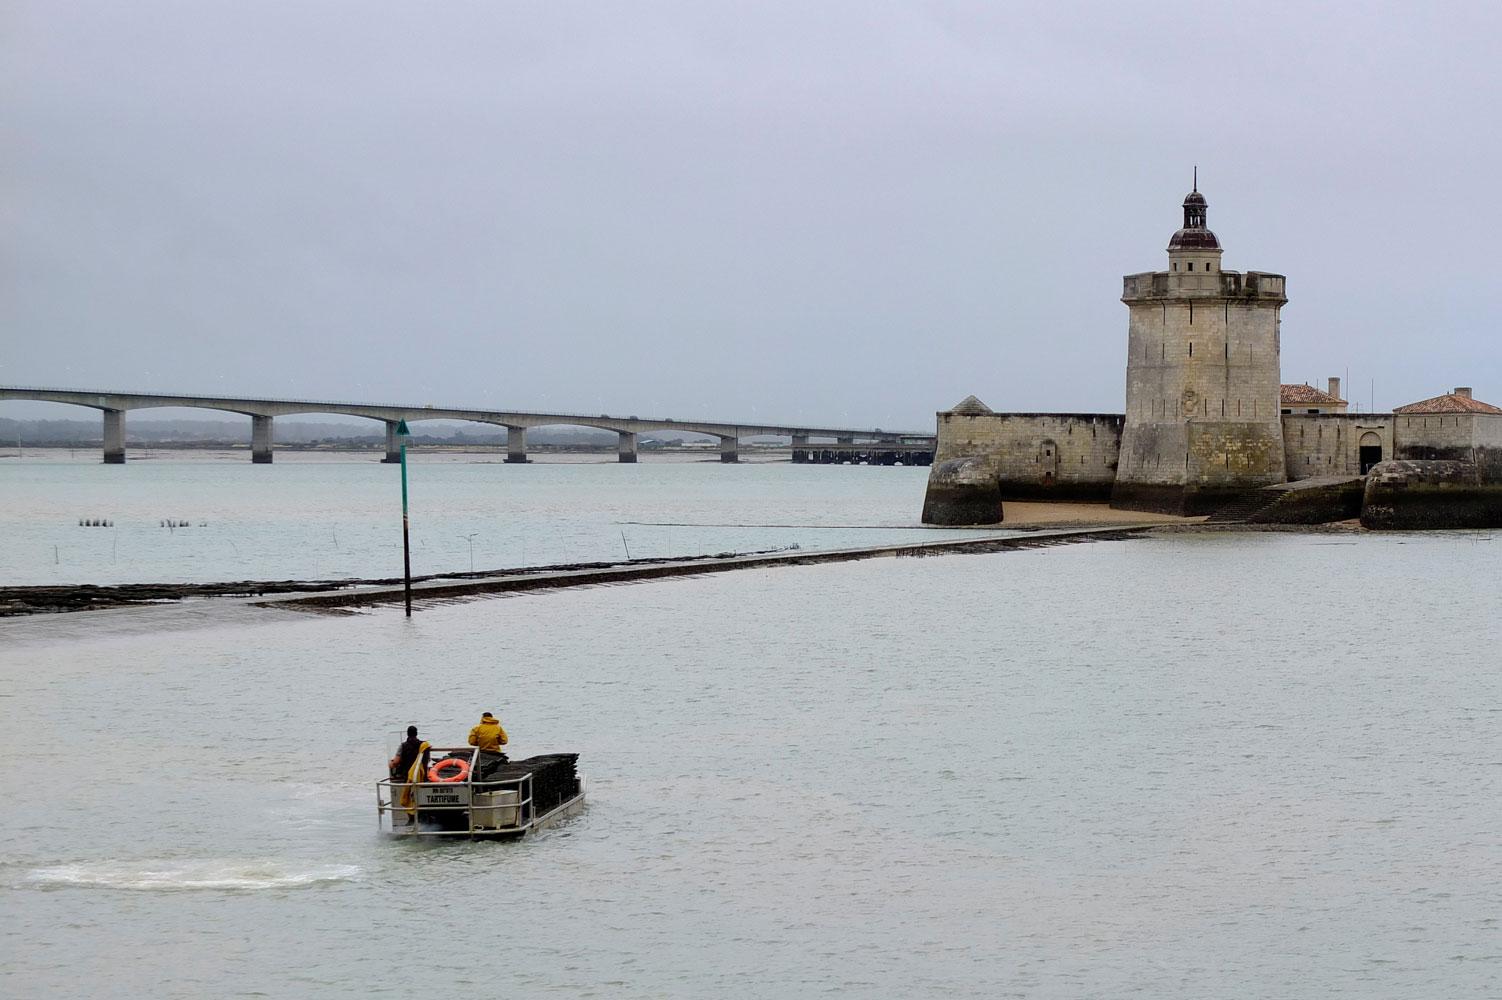 Fort Louvois - Bourcefranc